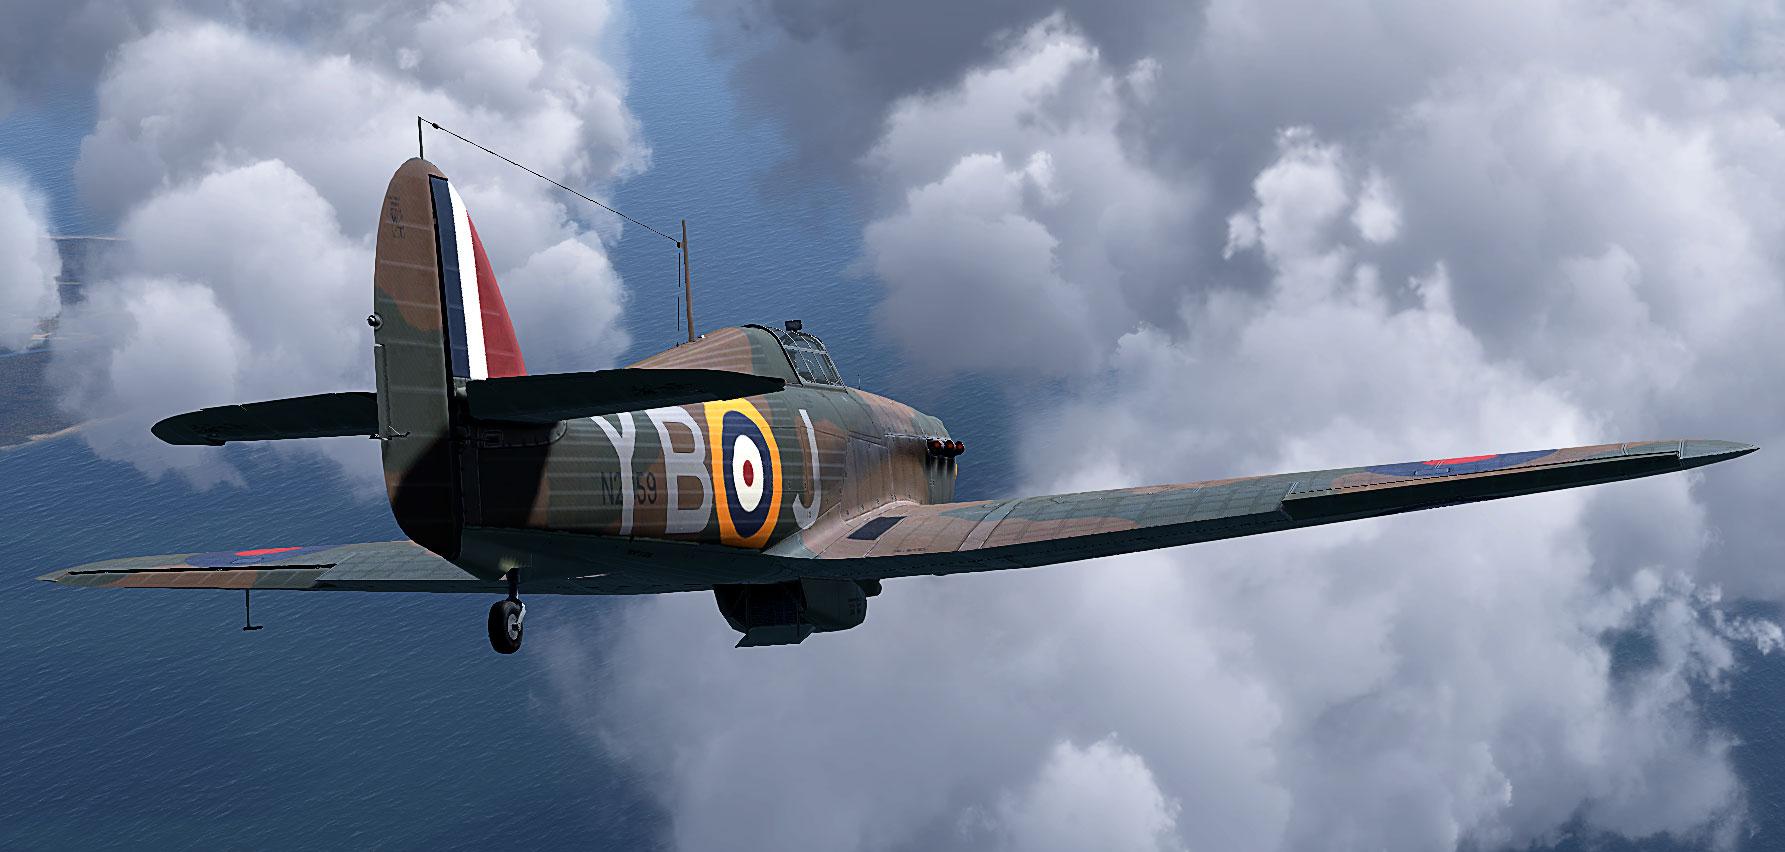 COD KF Hurricane I RAF 17Sqn YBJ N2359 Stevens Debden England 1940 V02